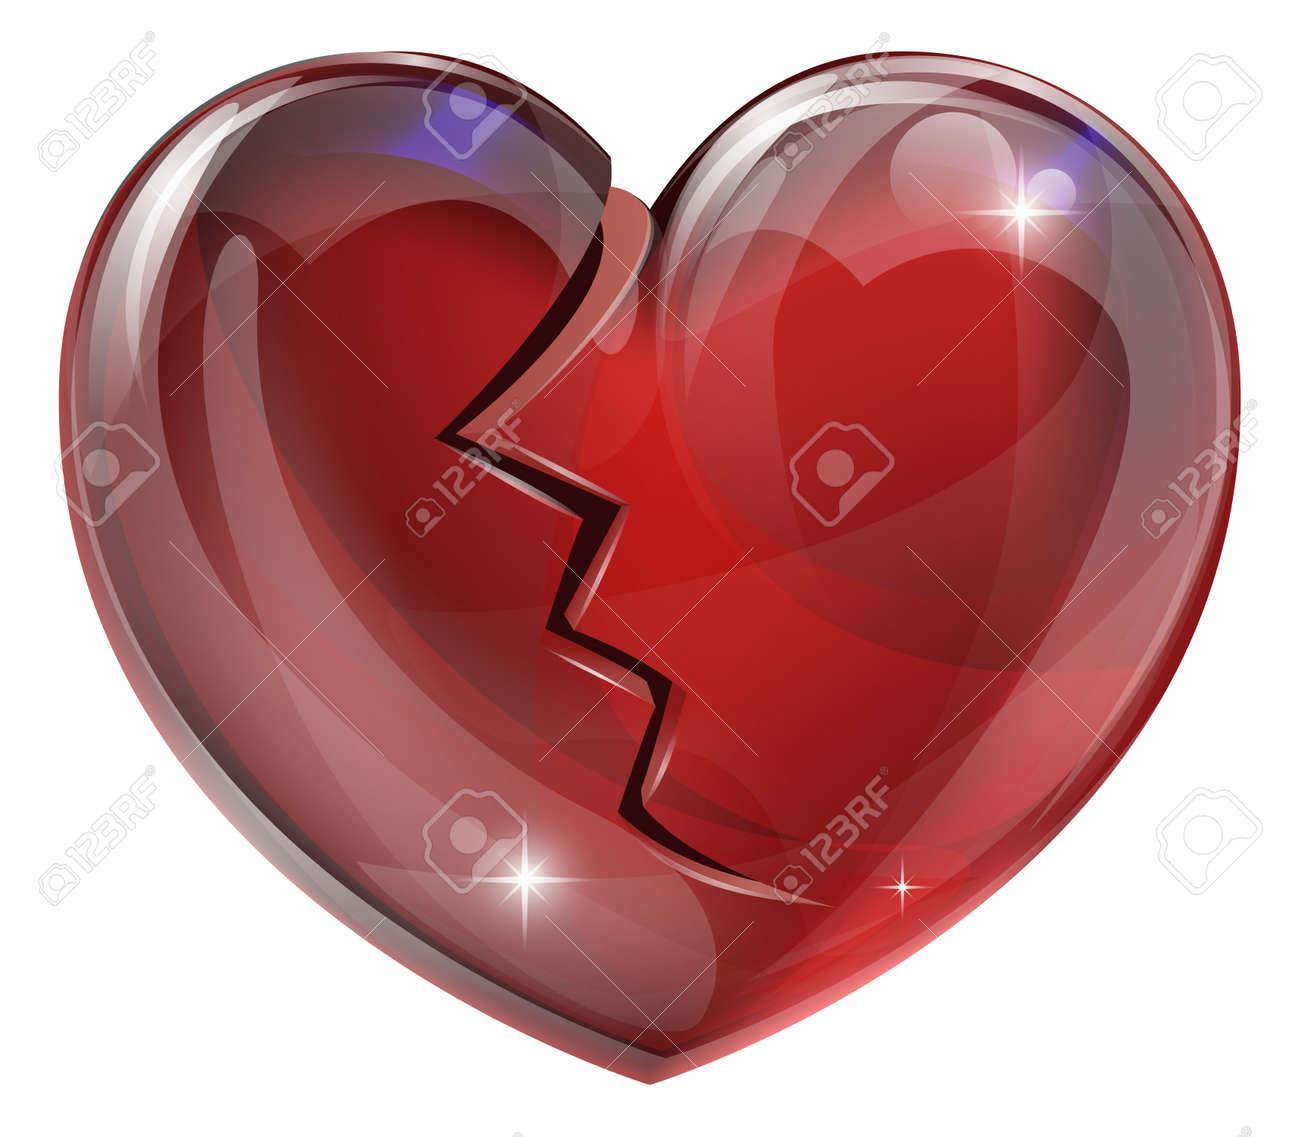 6,874 Broken Heart Cliparts, Stock Vector And Royalty Free Broken ...